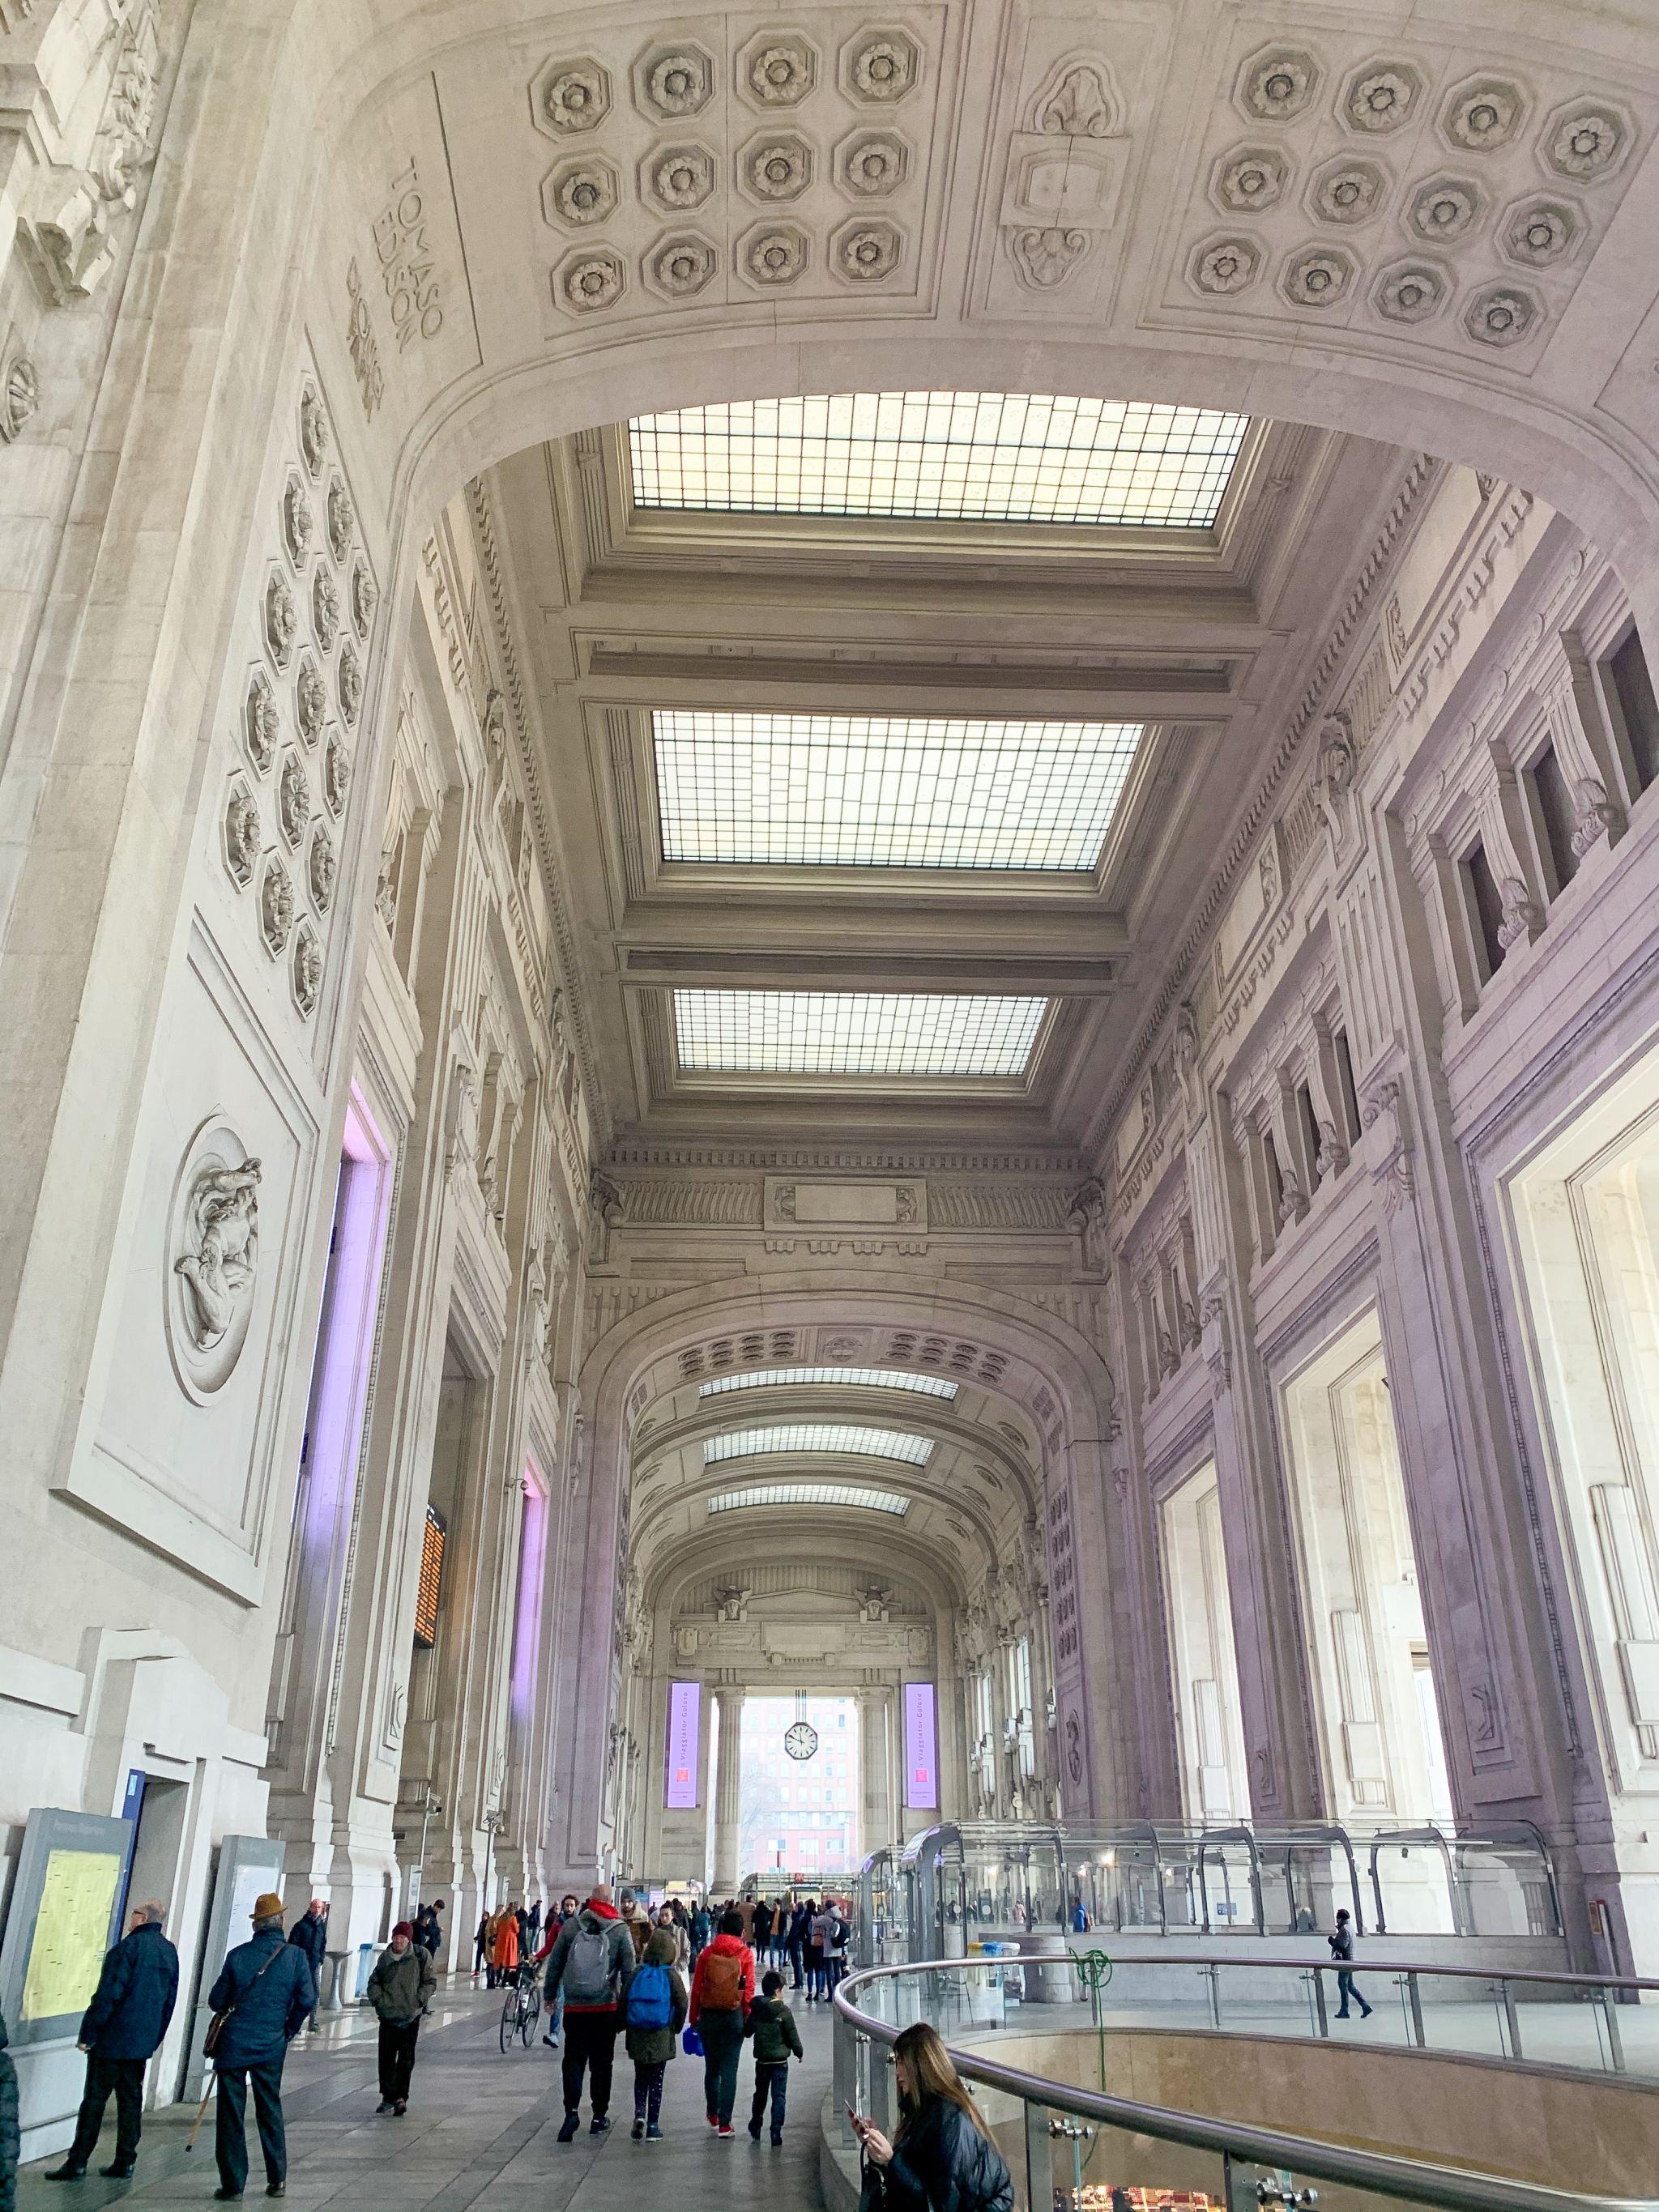 Milan central train station